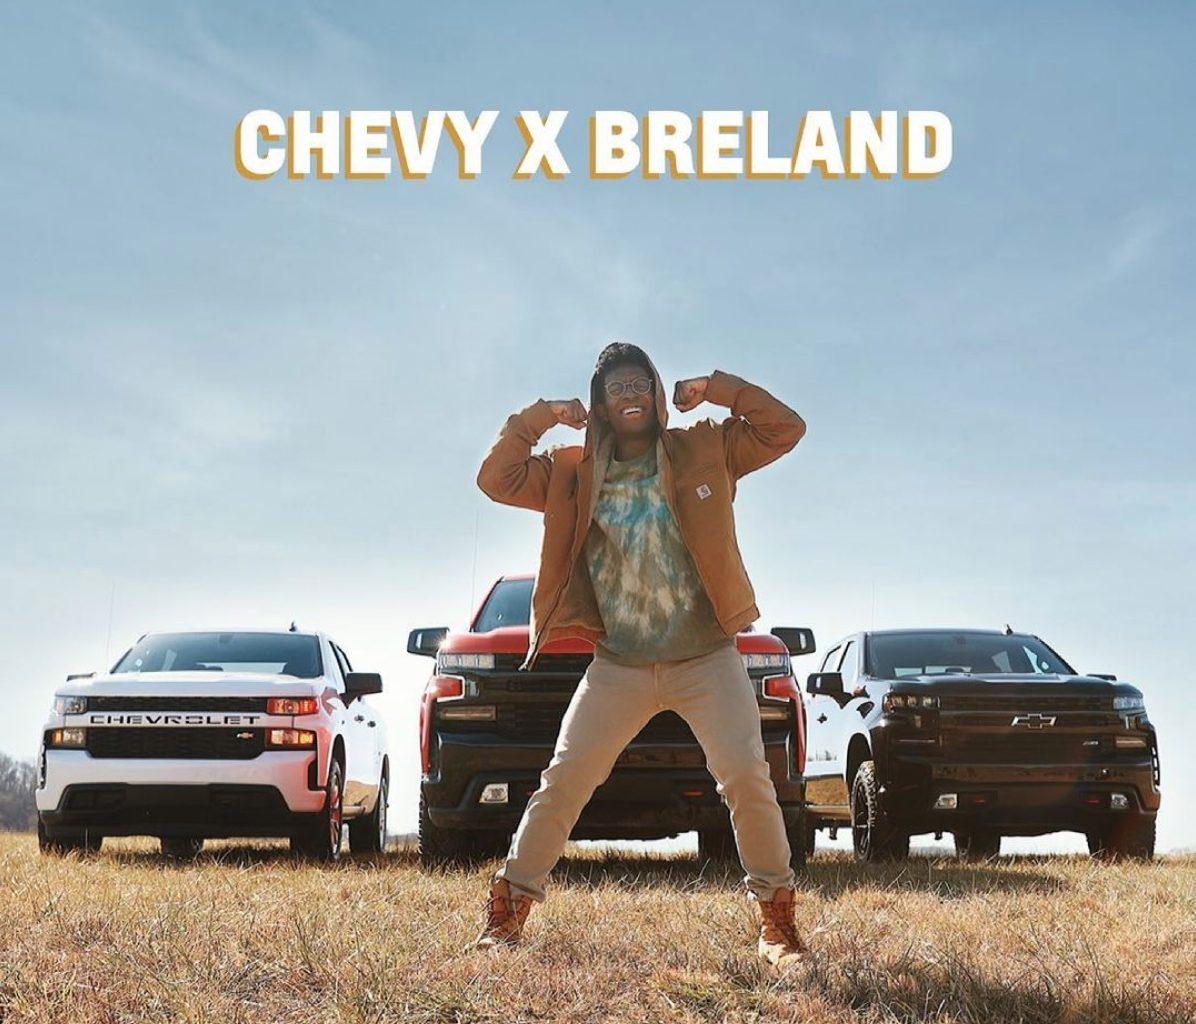 Chevy x Breland